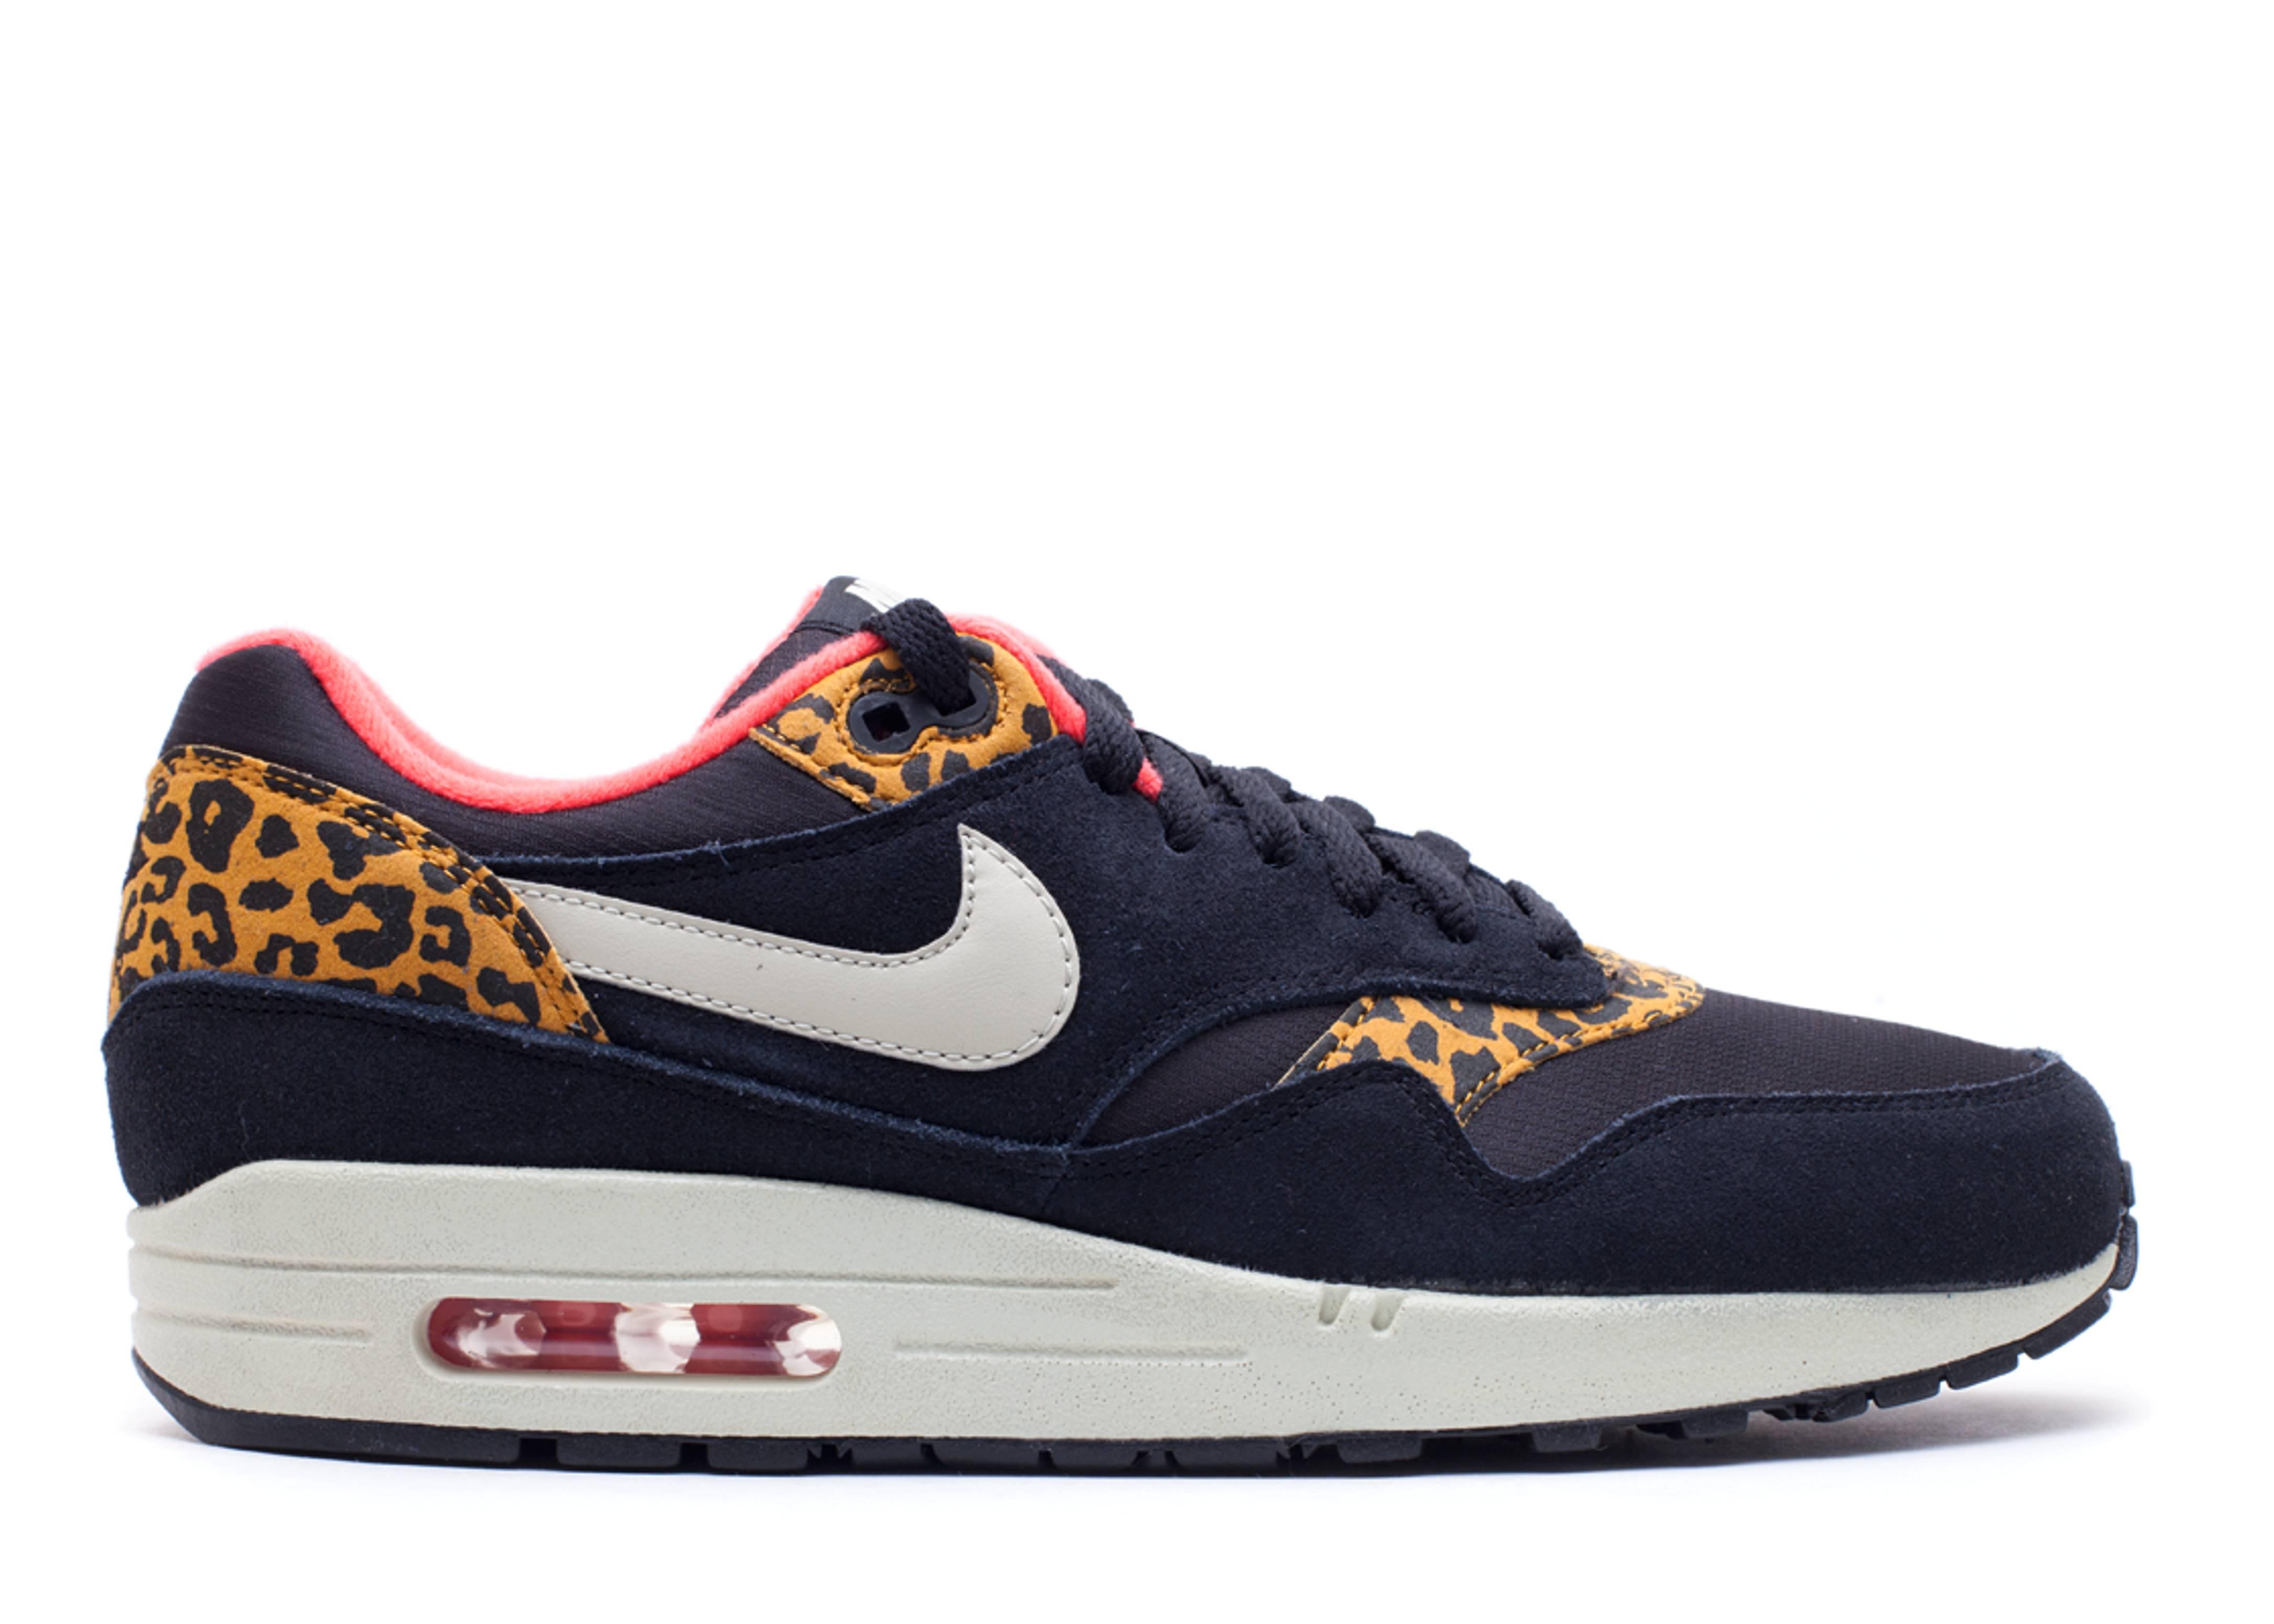 Nike Air Max 1 'Black Leopard' Trainers Sandtrap Dark Gold